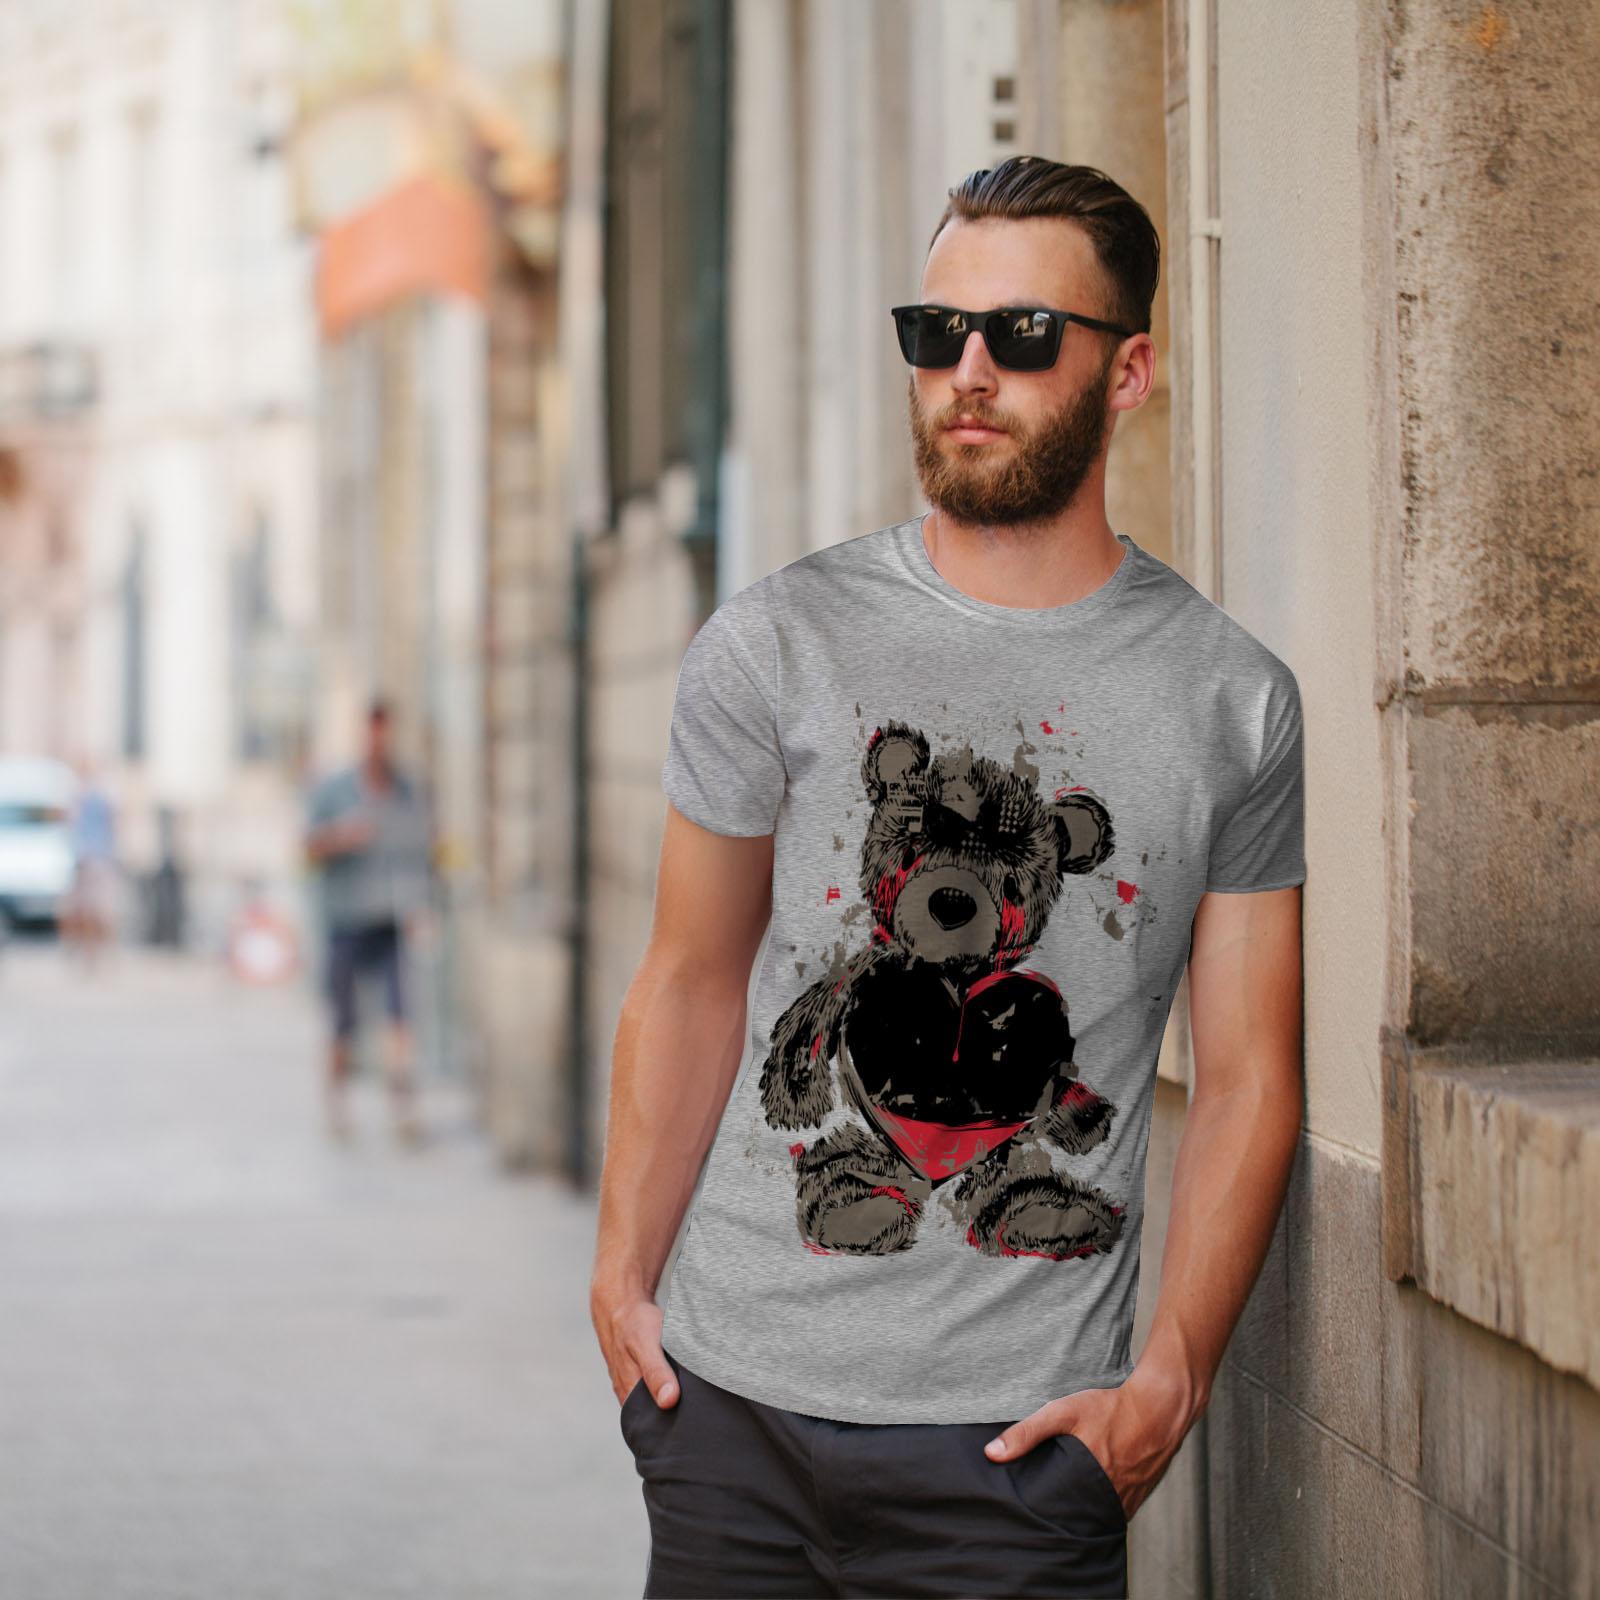 miniature 17 - Wellcoda Teddy Bear Love Hurt Mens T-shirt, Blood Graphic Design Printed Tee